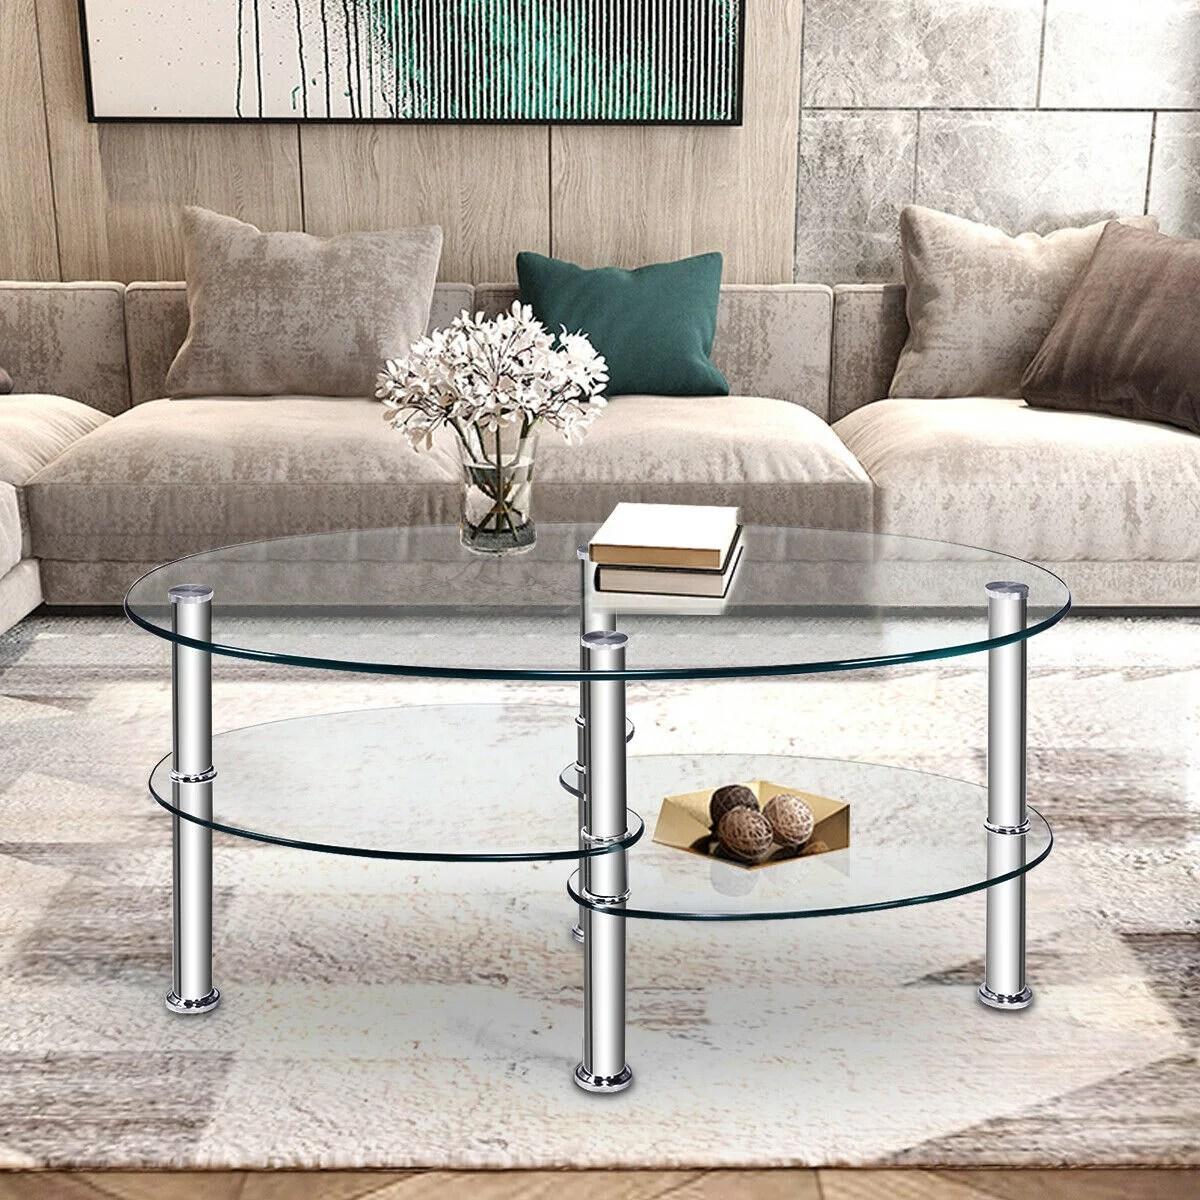 costway tempered glass oval side coffee table shelf chrome base living room clear walmart com